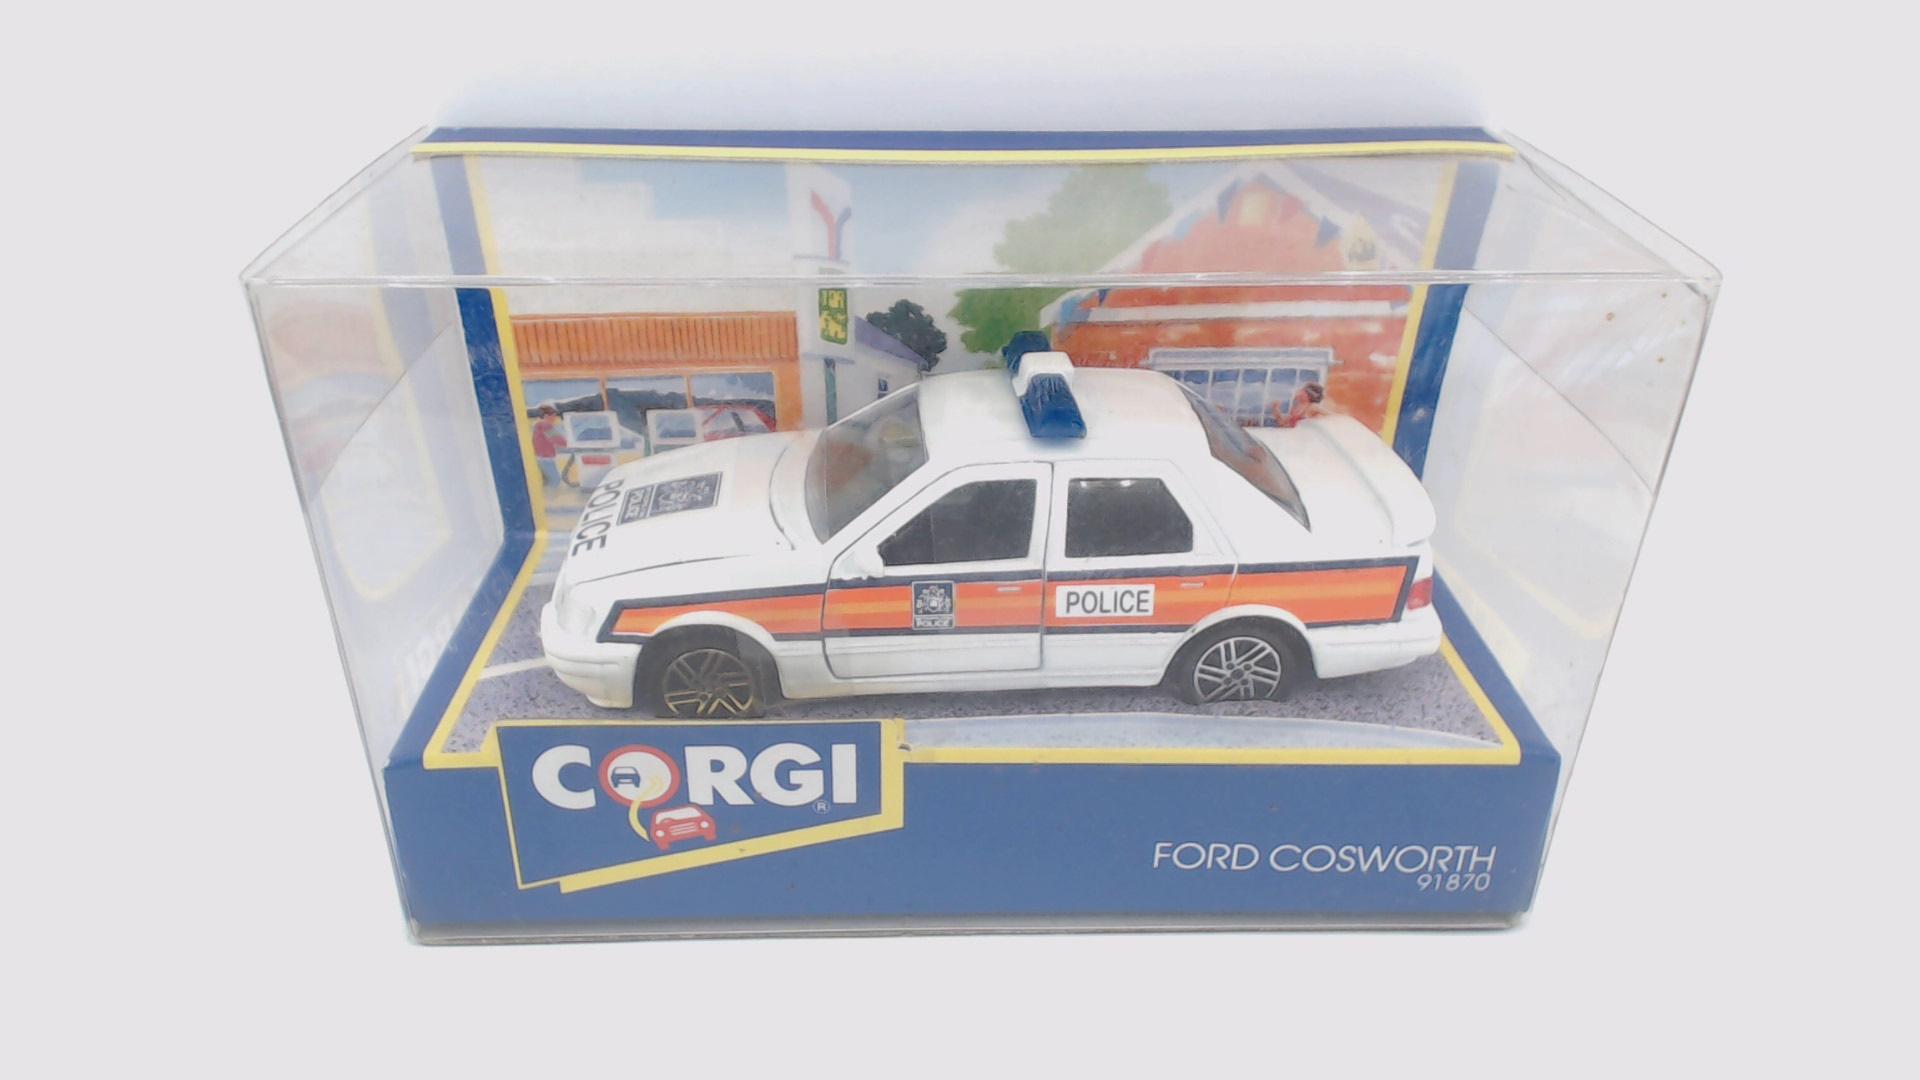 Picture Gallery for Corgi 91870 Ford Cosworth